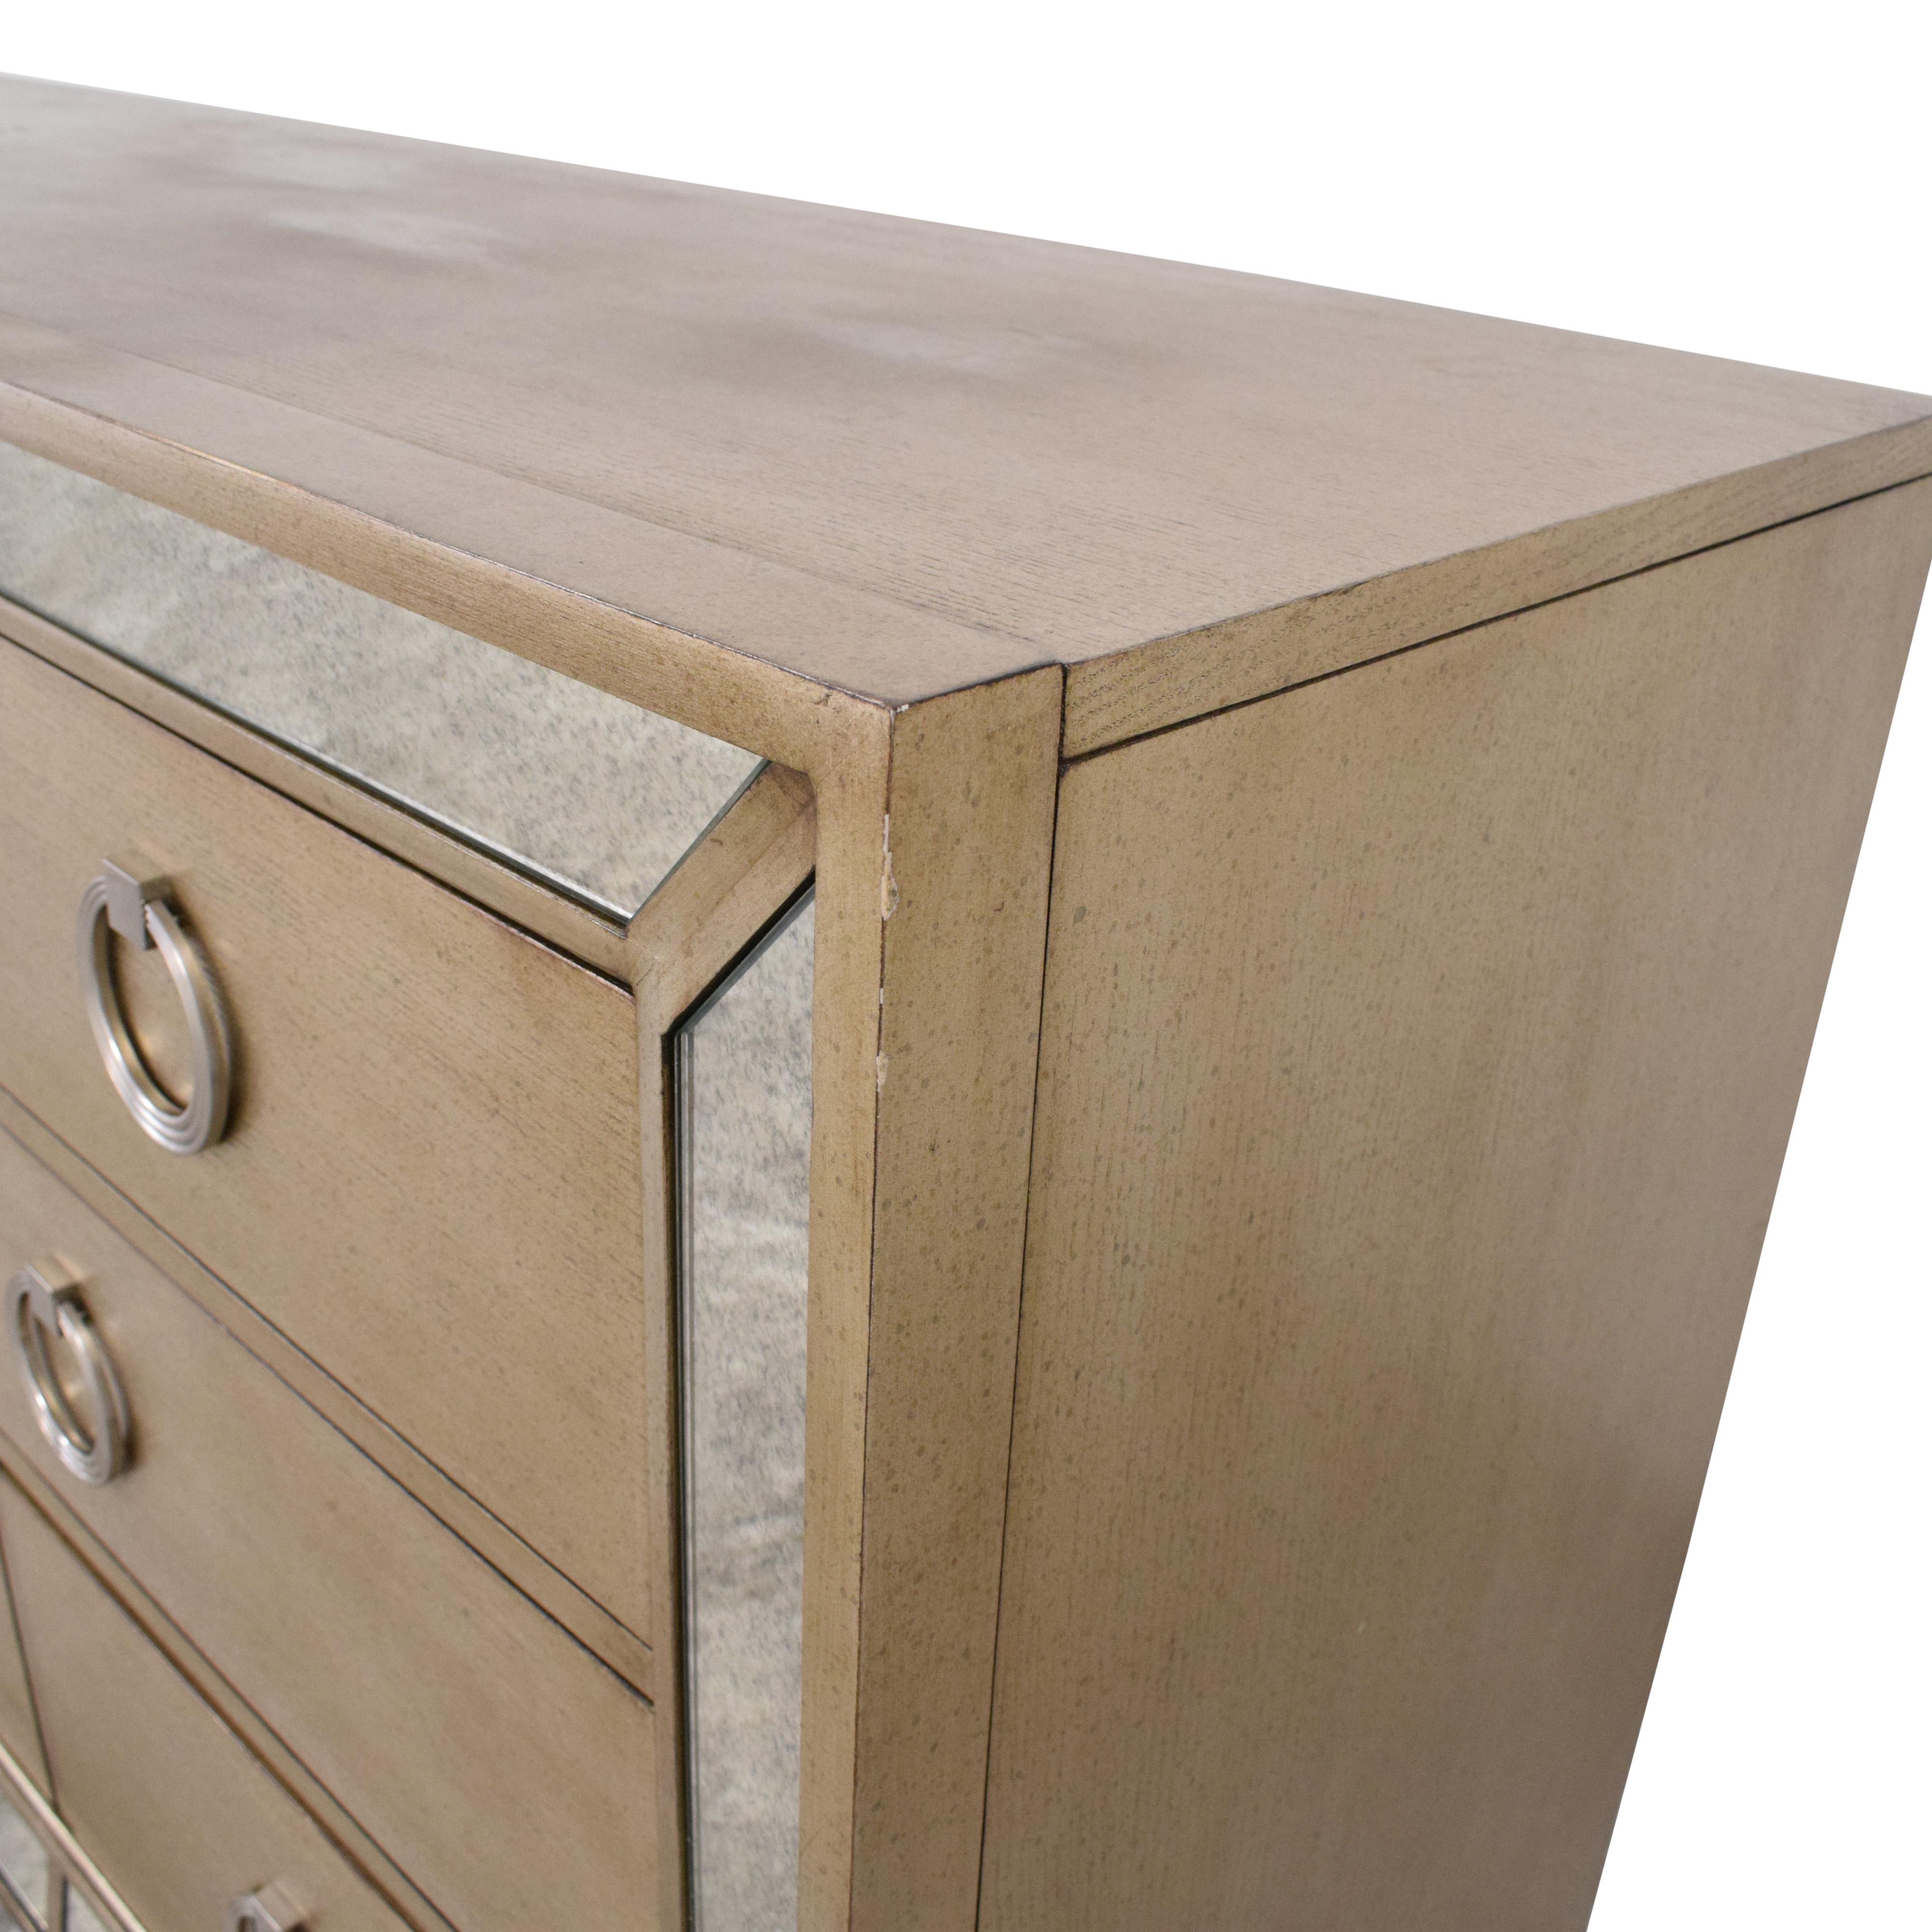 Macy's Macy's Ailey 8 Drawer Dresser nj